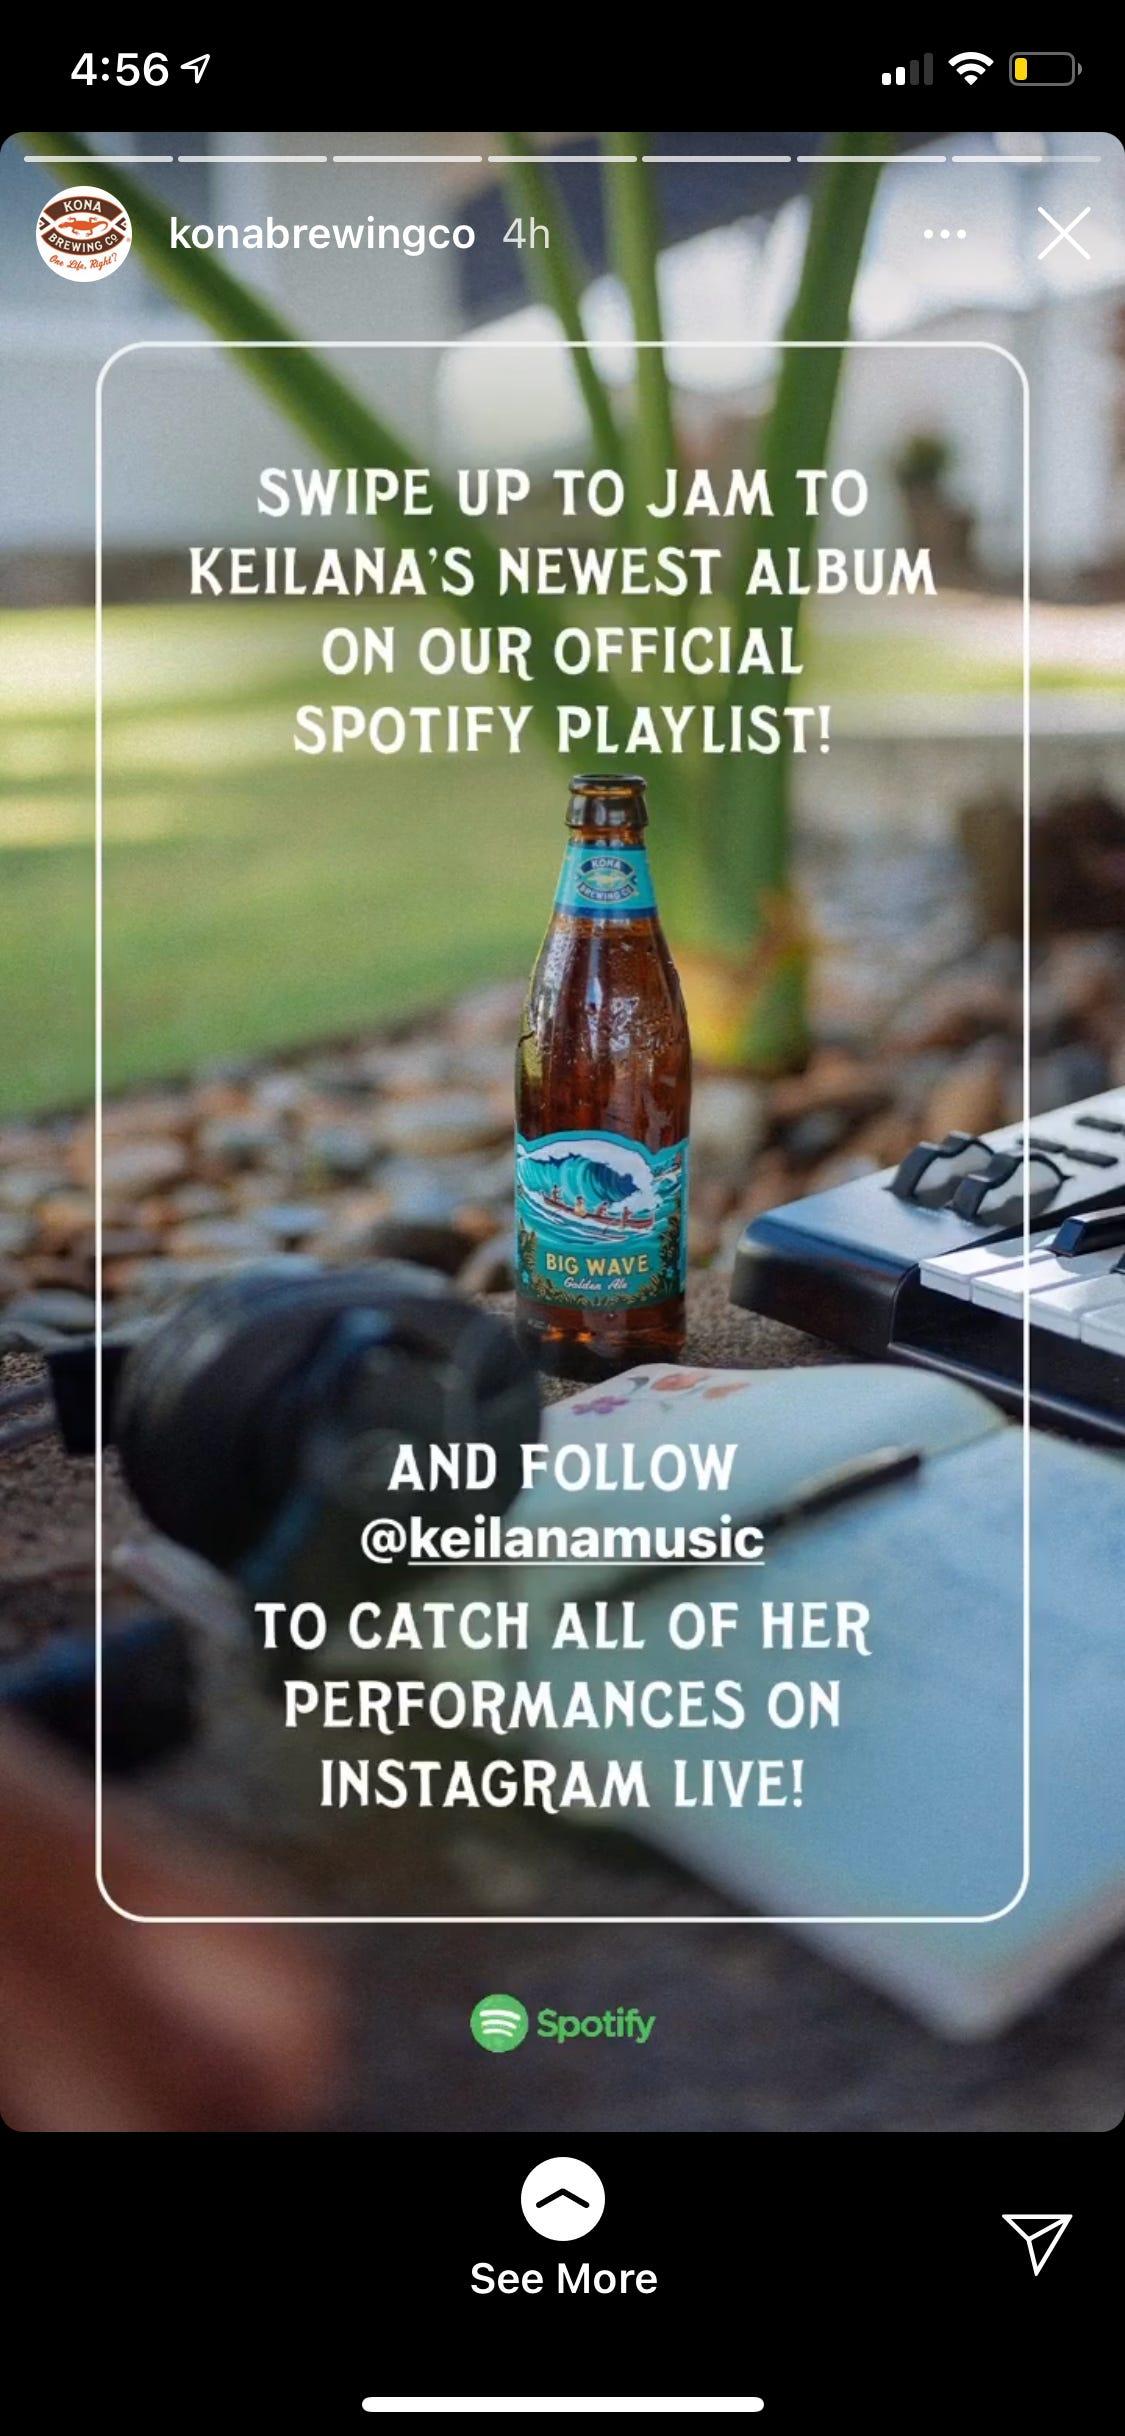 Kona Insta story promoting Spotify playlist